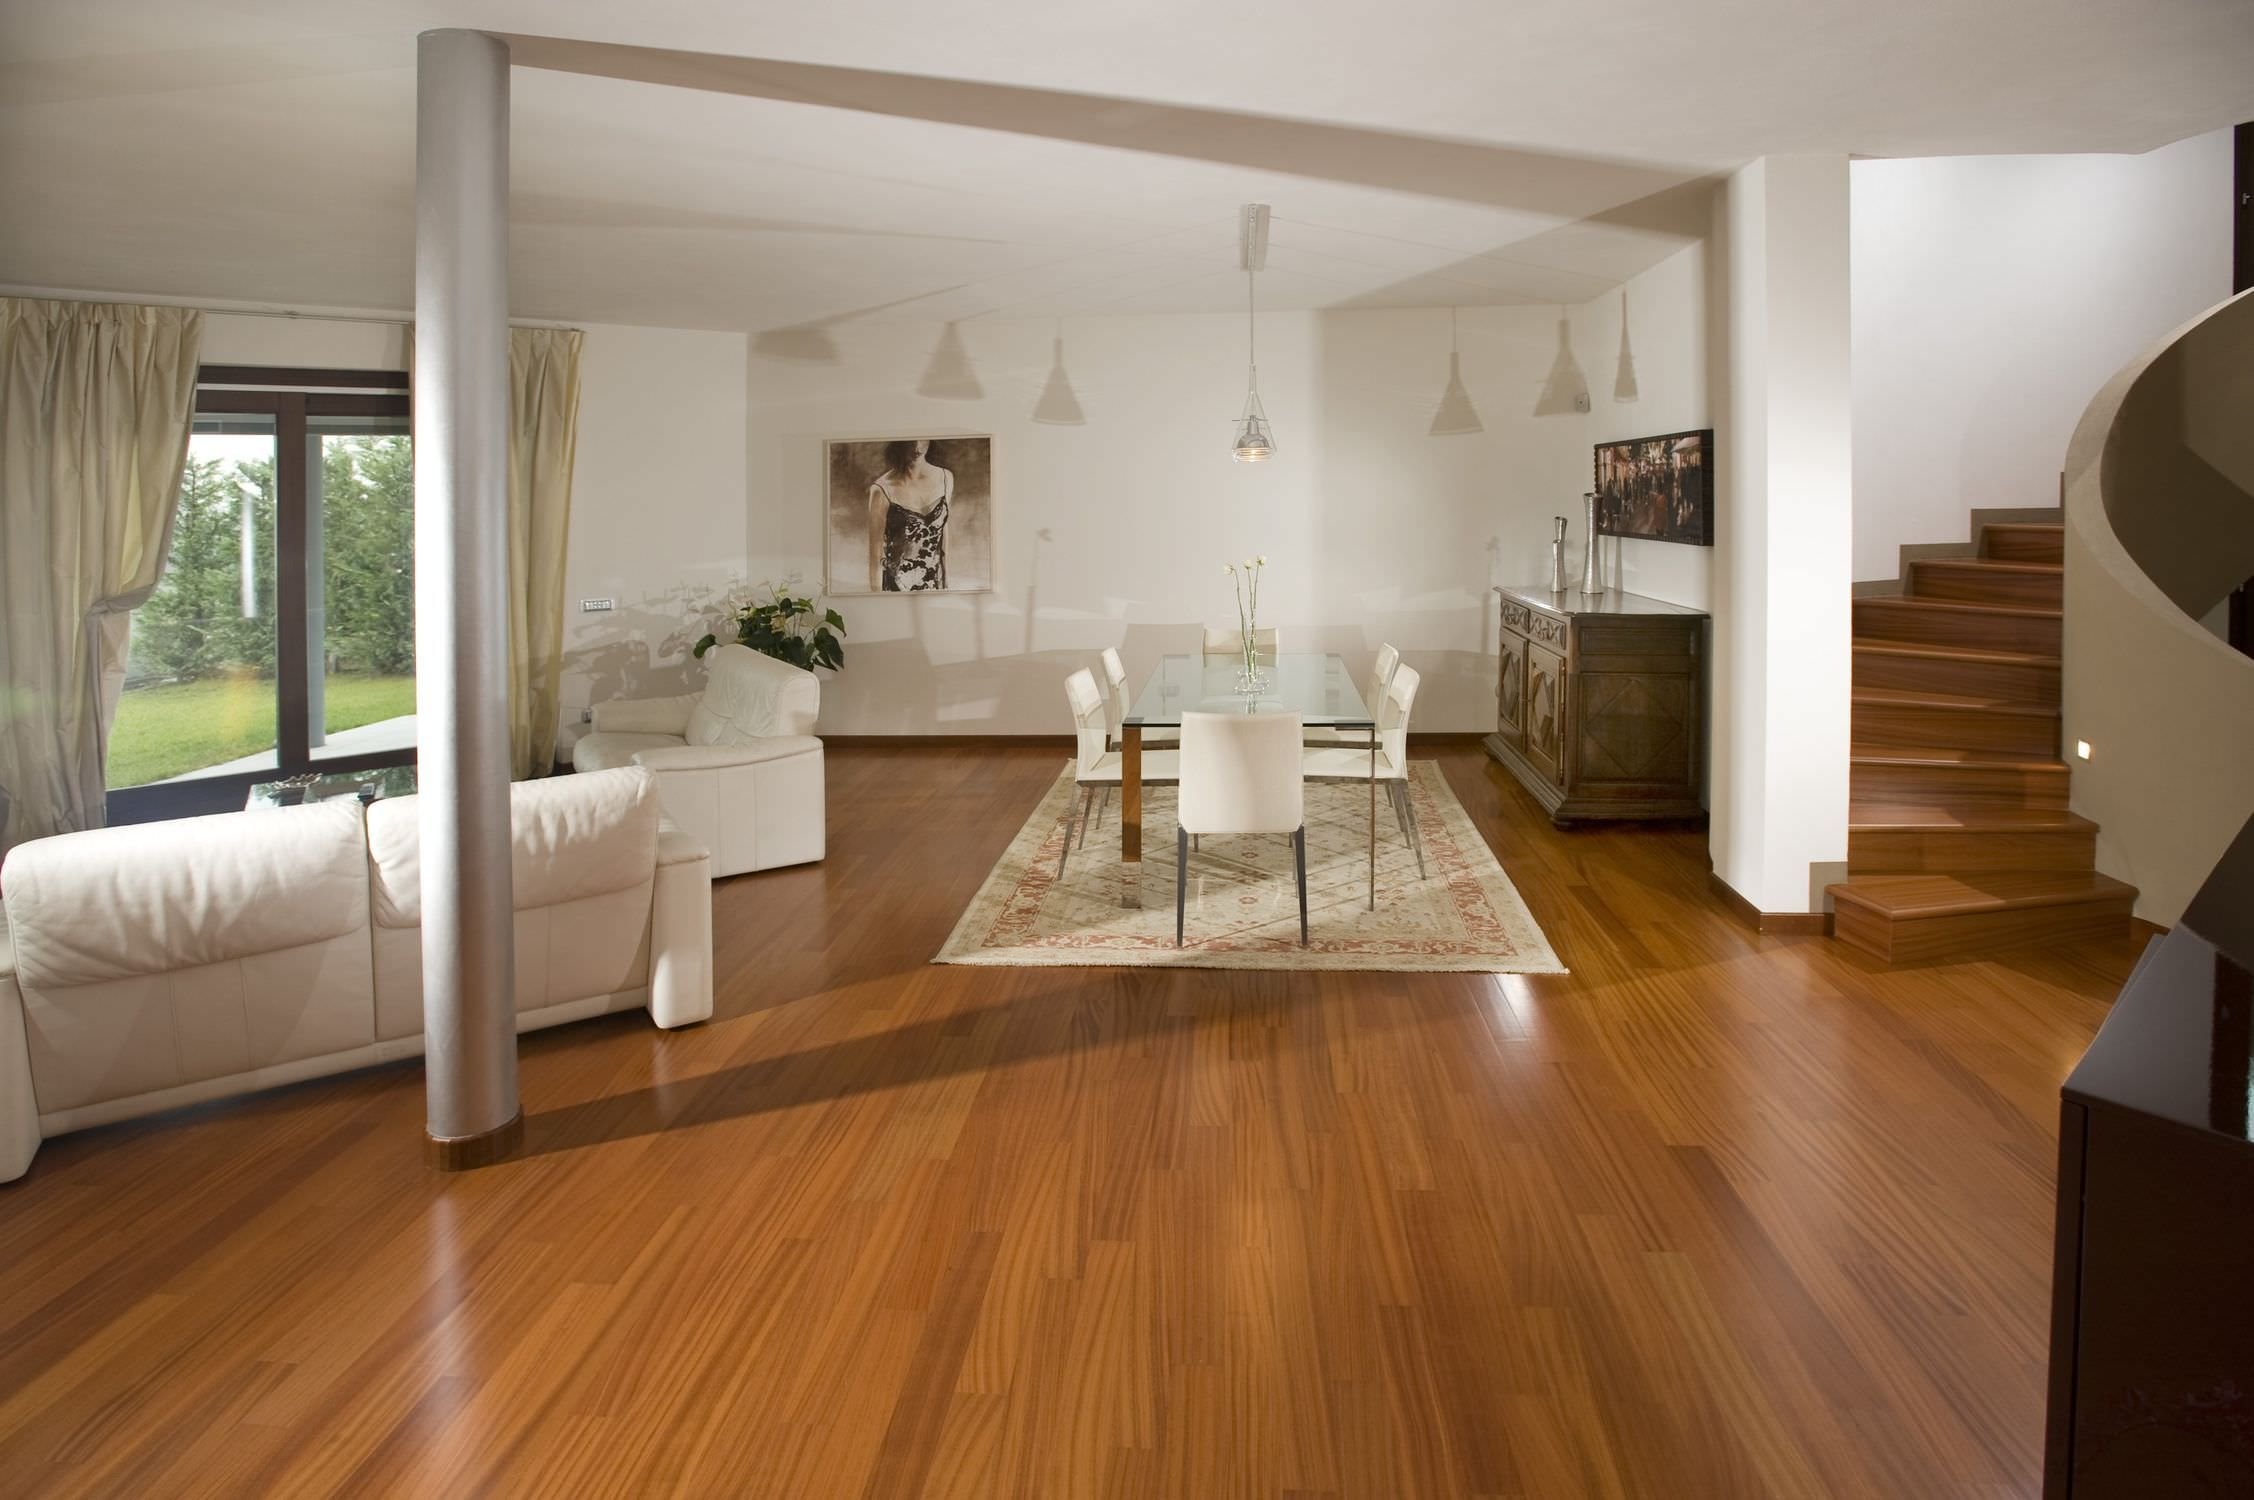 Engineered wood flooring uk sale - 17 Best Images About Engineered Flooring On Pinterest Hickory Flooring Shop By And Solid Wood Flooring